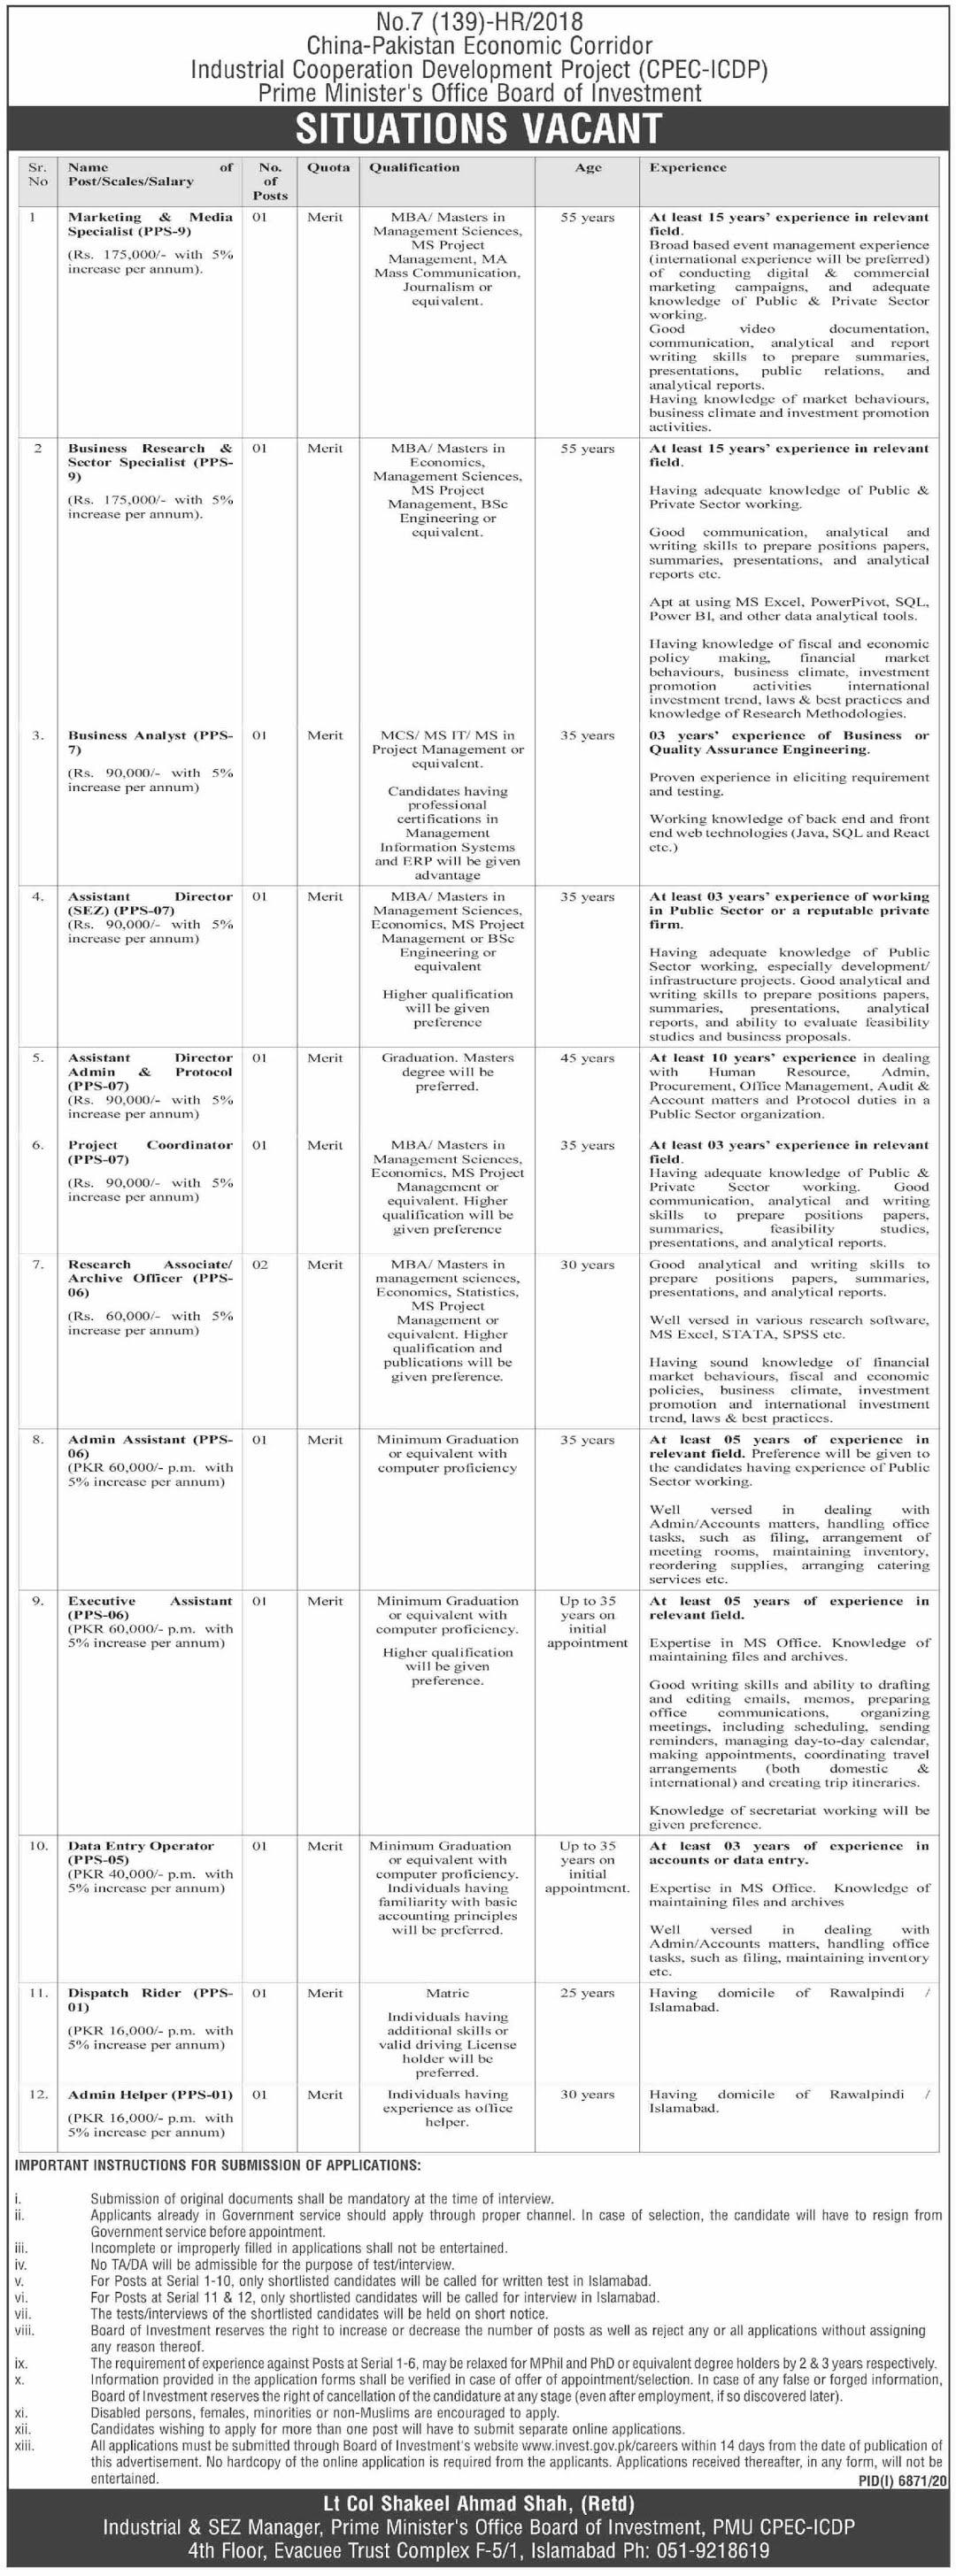 www.invest.gov.pk Jobs 2021 - China Pakistan Economic Corridor (CPEC) Jobs 2021 in Pakistan